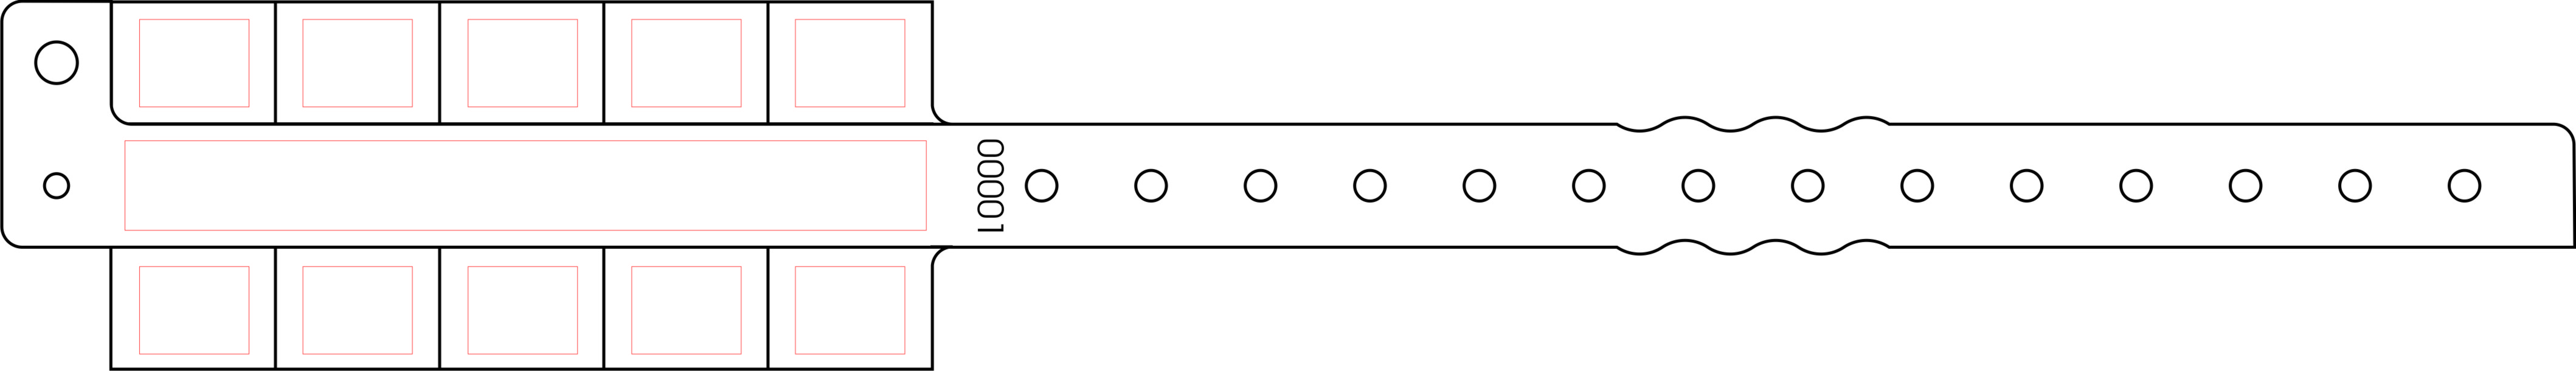 image regarding Tyvek Wristbands Printable referred to as Printable Wristband Template